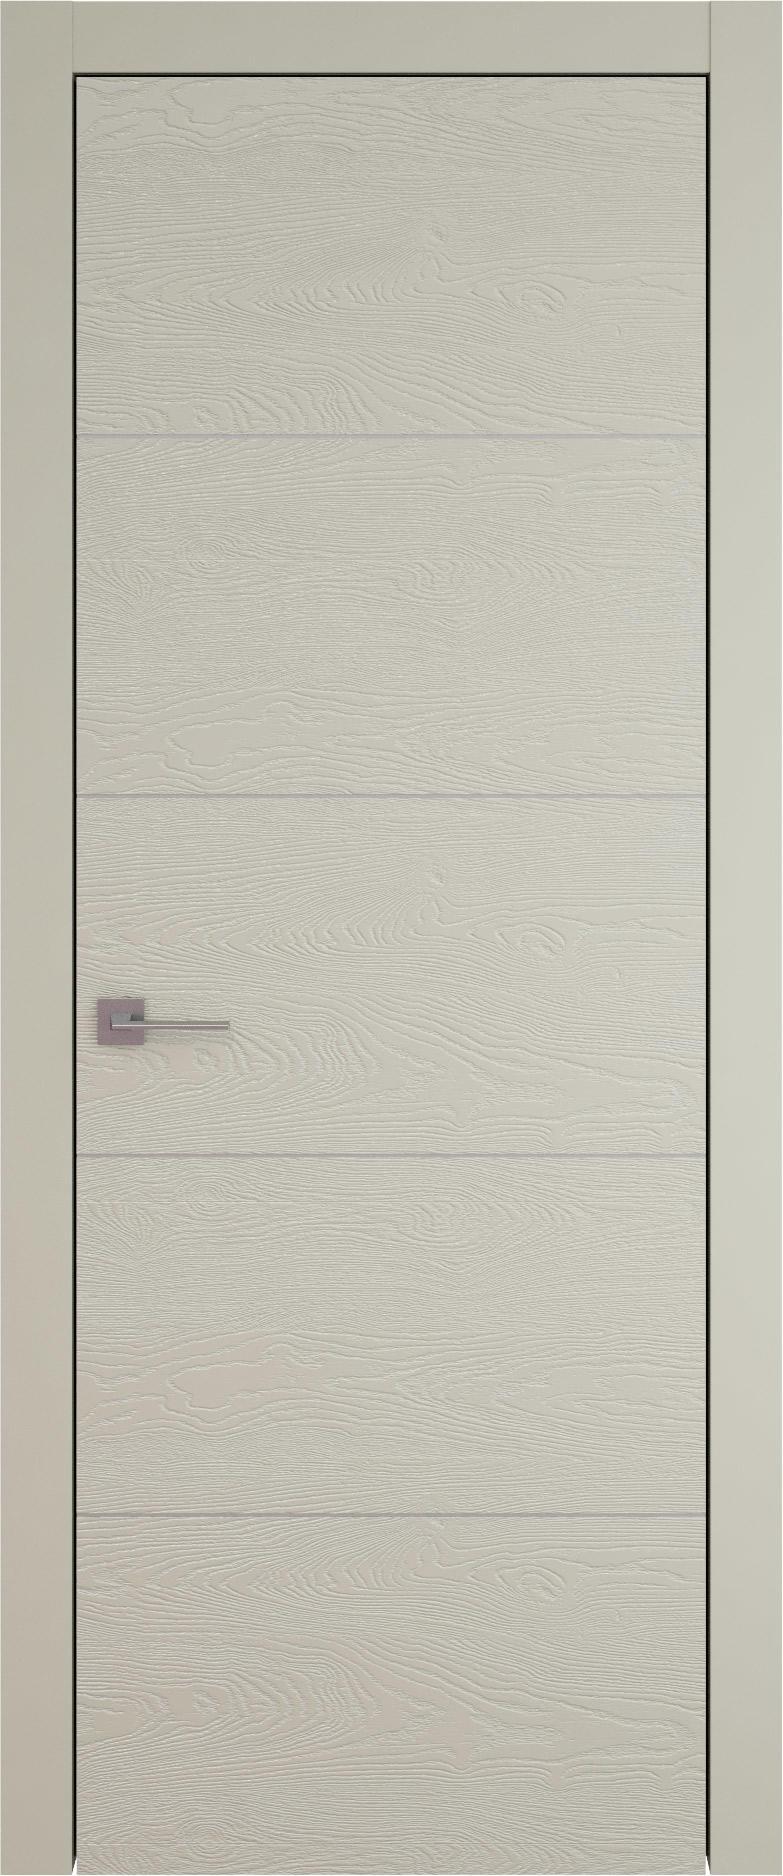 Tivoli Д-3 цвет - Серо-оливковая эмаль по шпону (RAL 7032) Без стекла (ДГ)